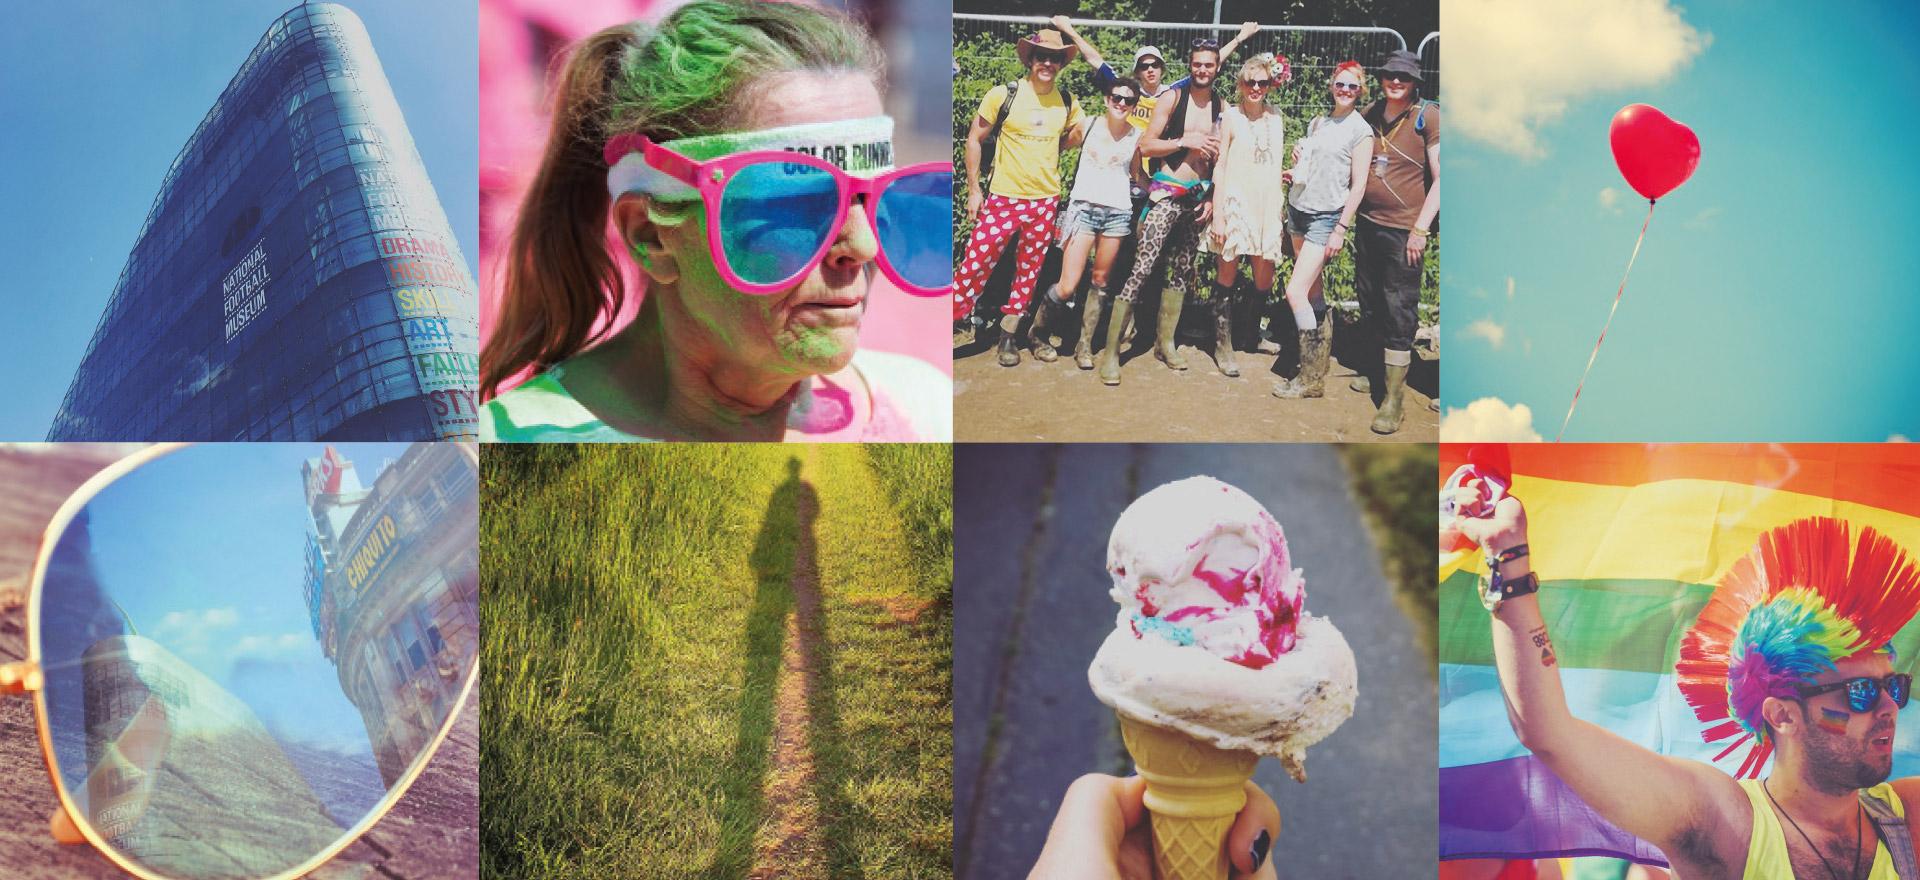 header-catch-the-summer-social-media-instagram-campaign